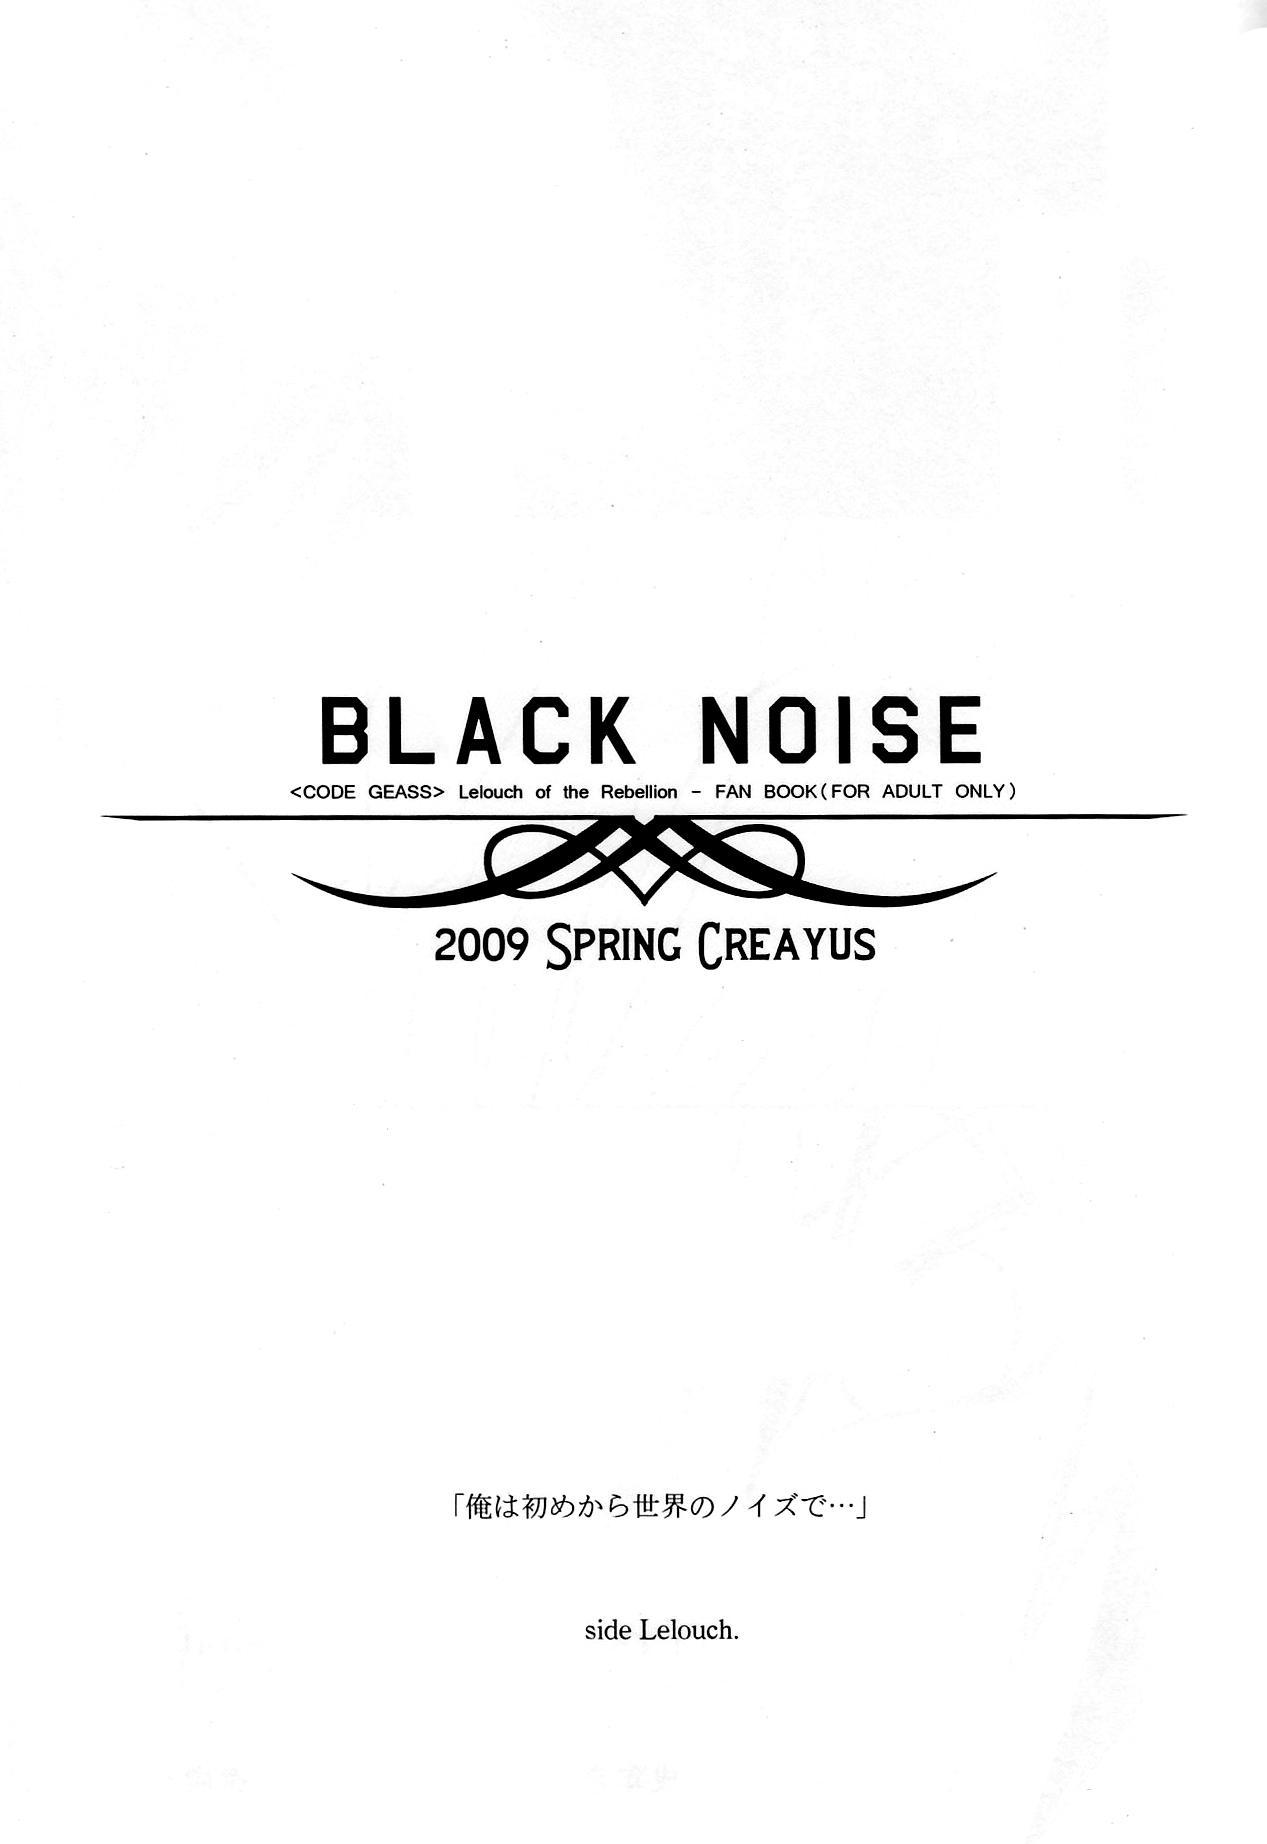 BLACKNOISE 1